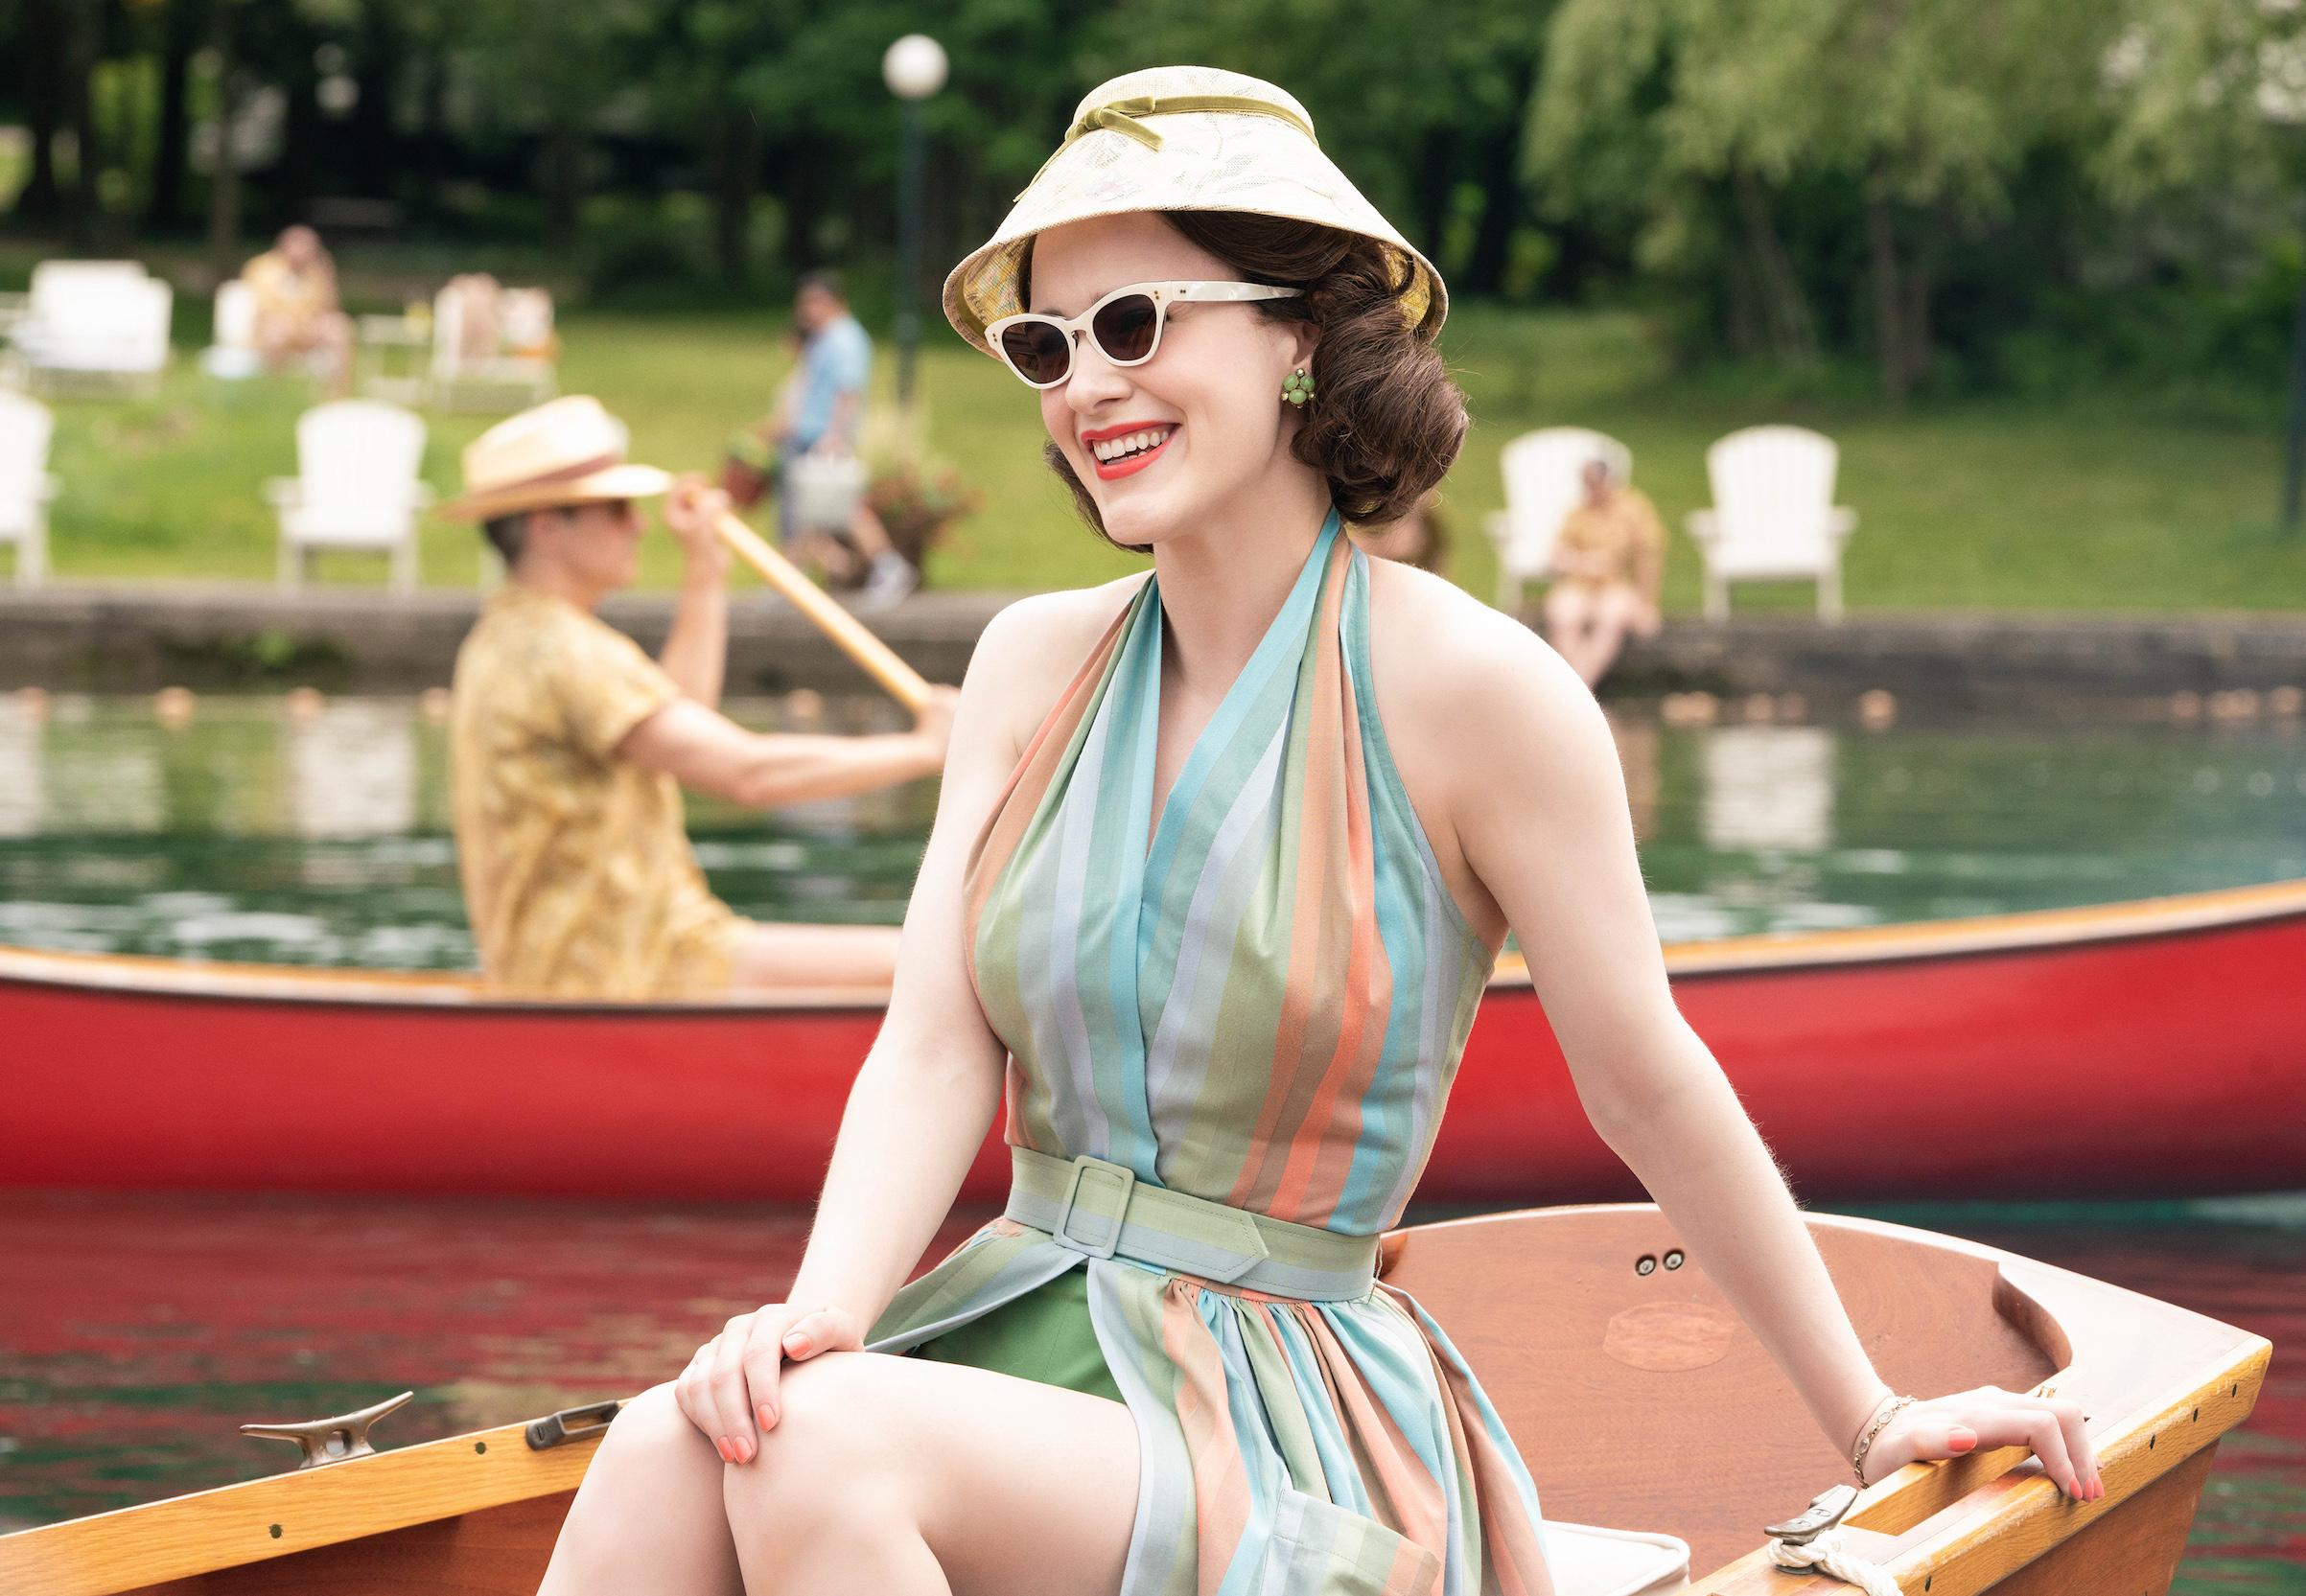 The Marvelous Mrs. Maisel: Season 2